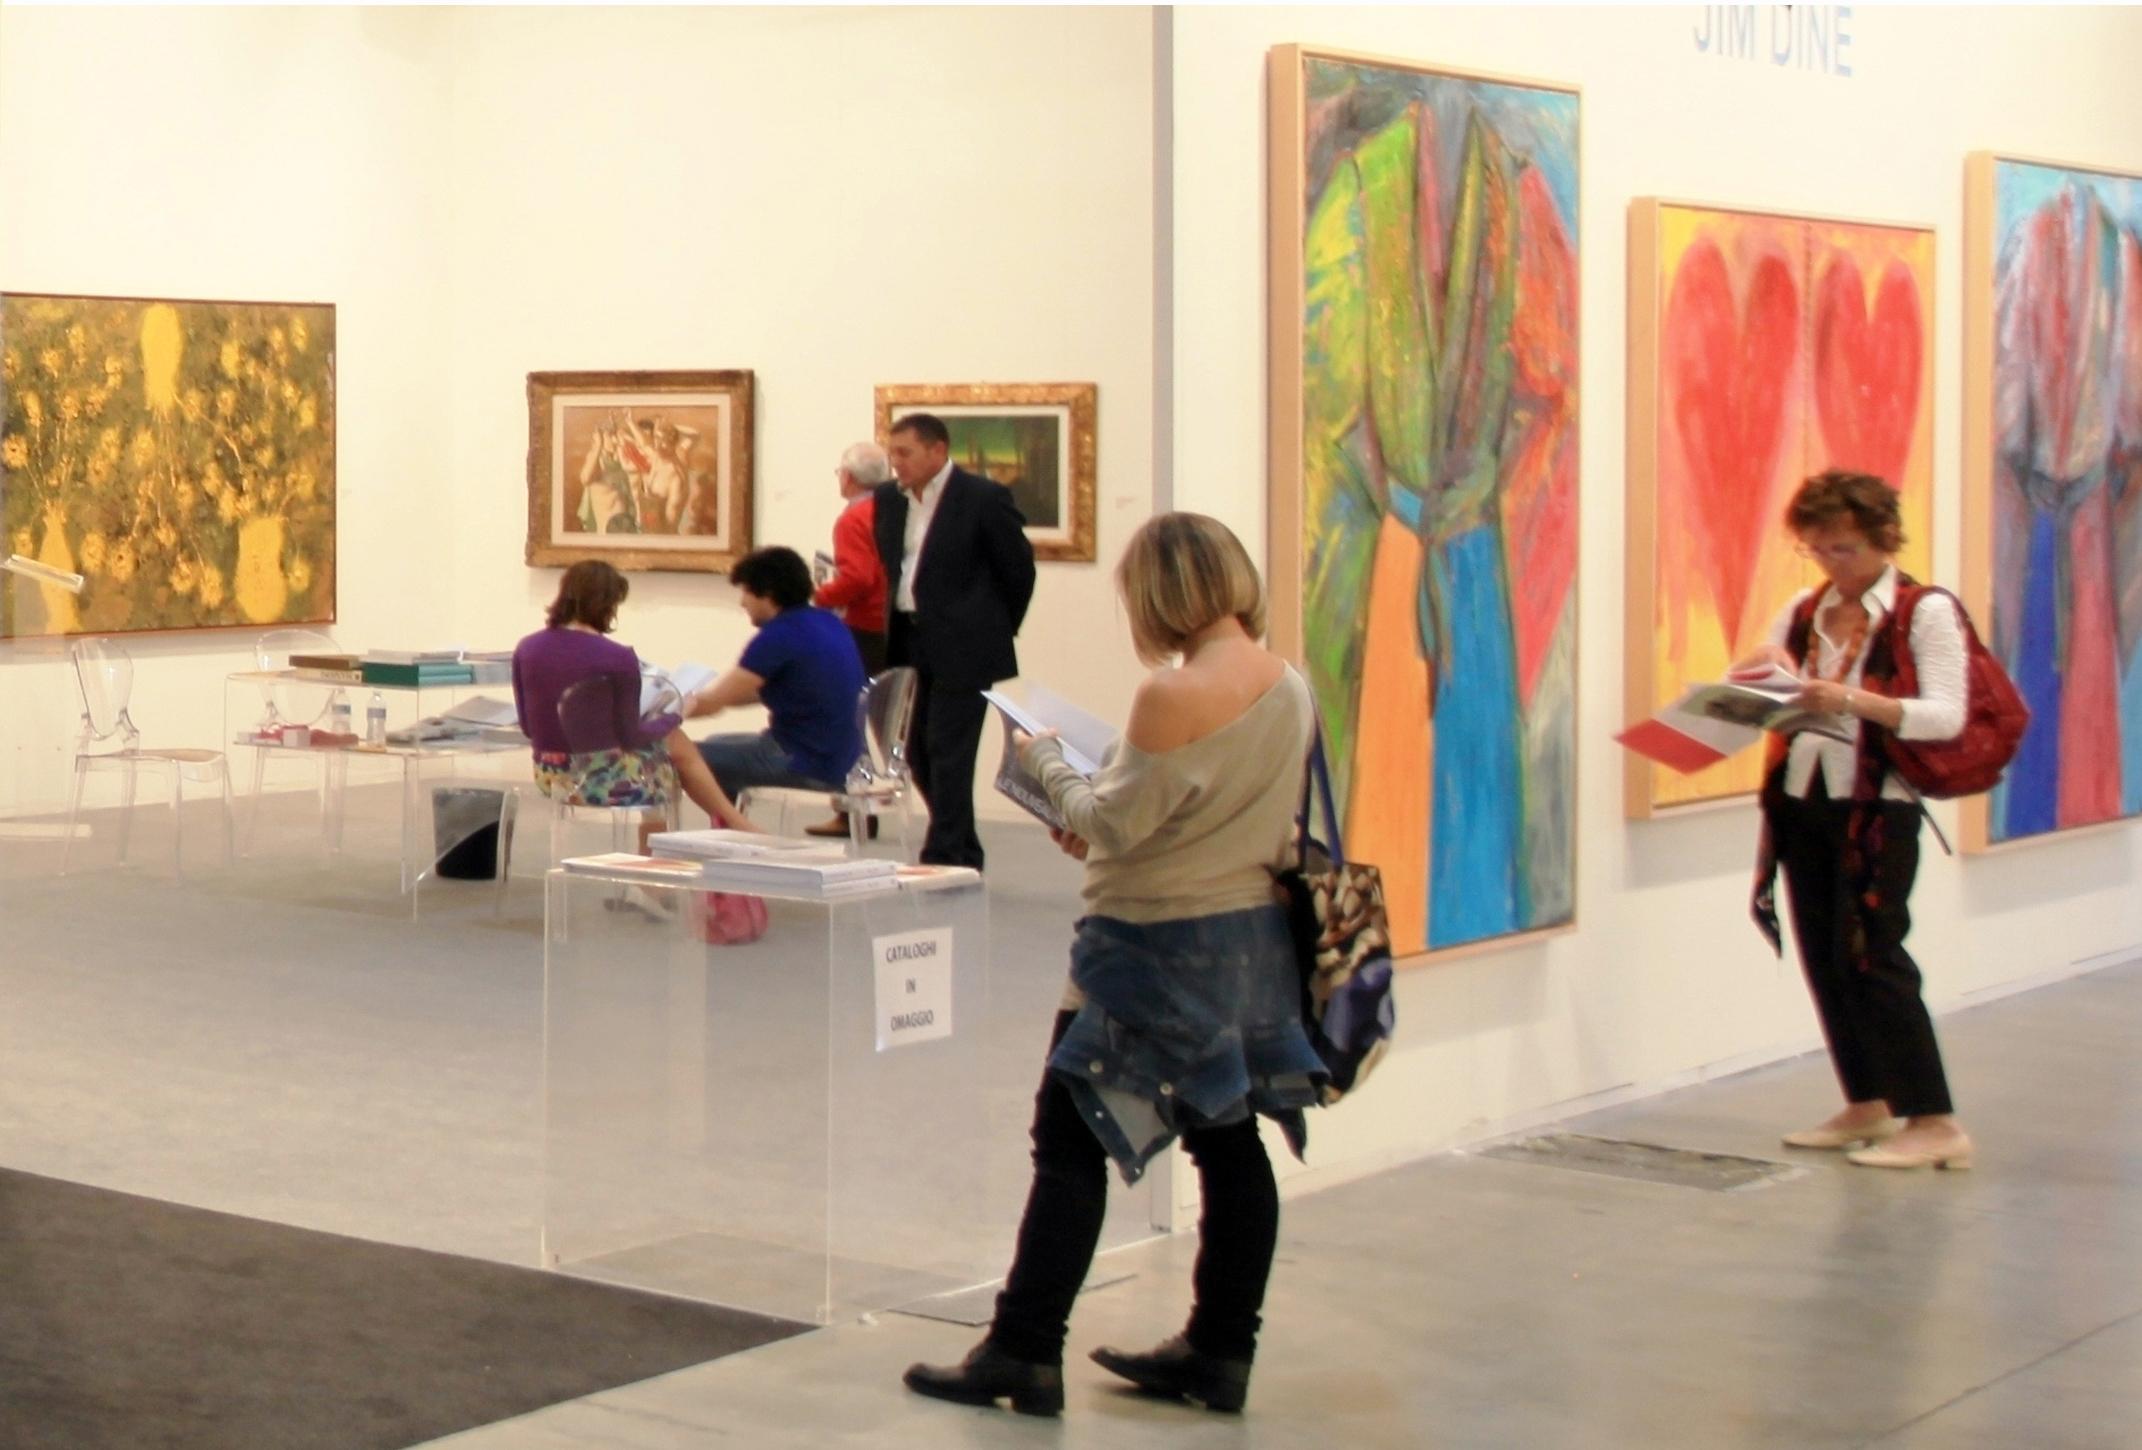 Asesoramos tu exposición de obras de Arte